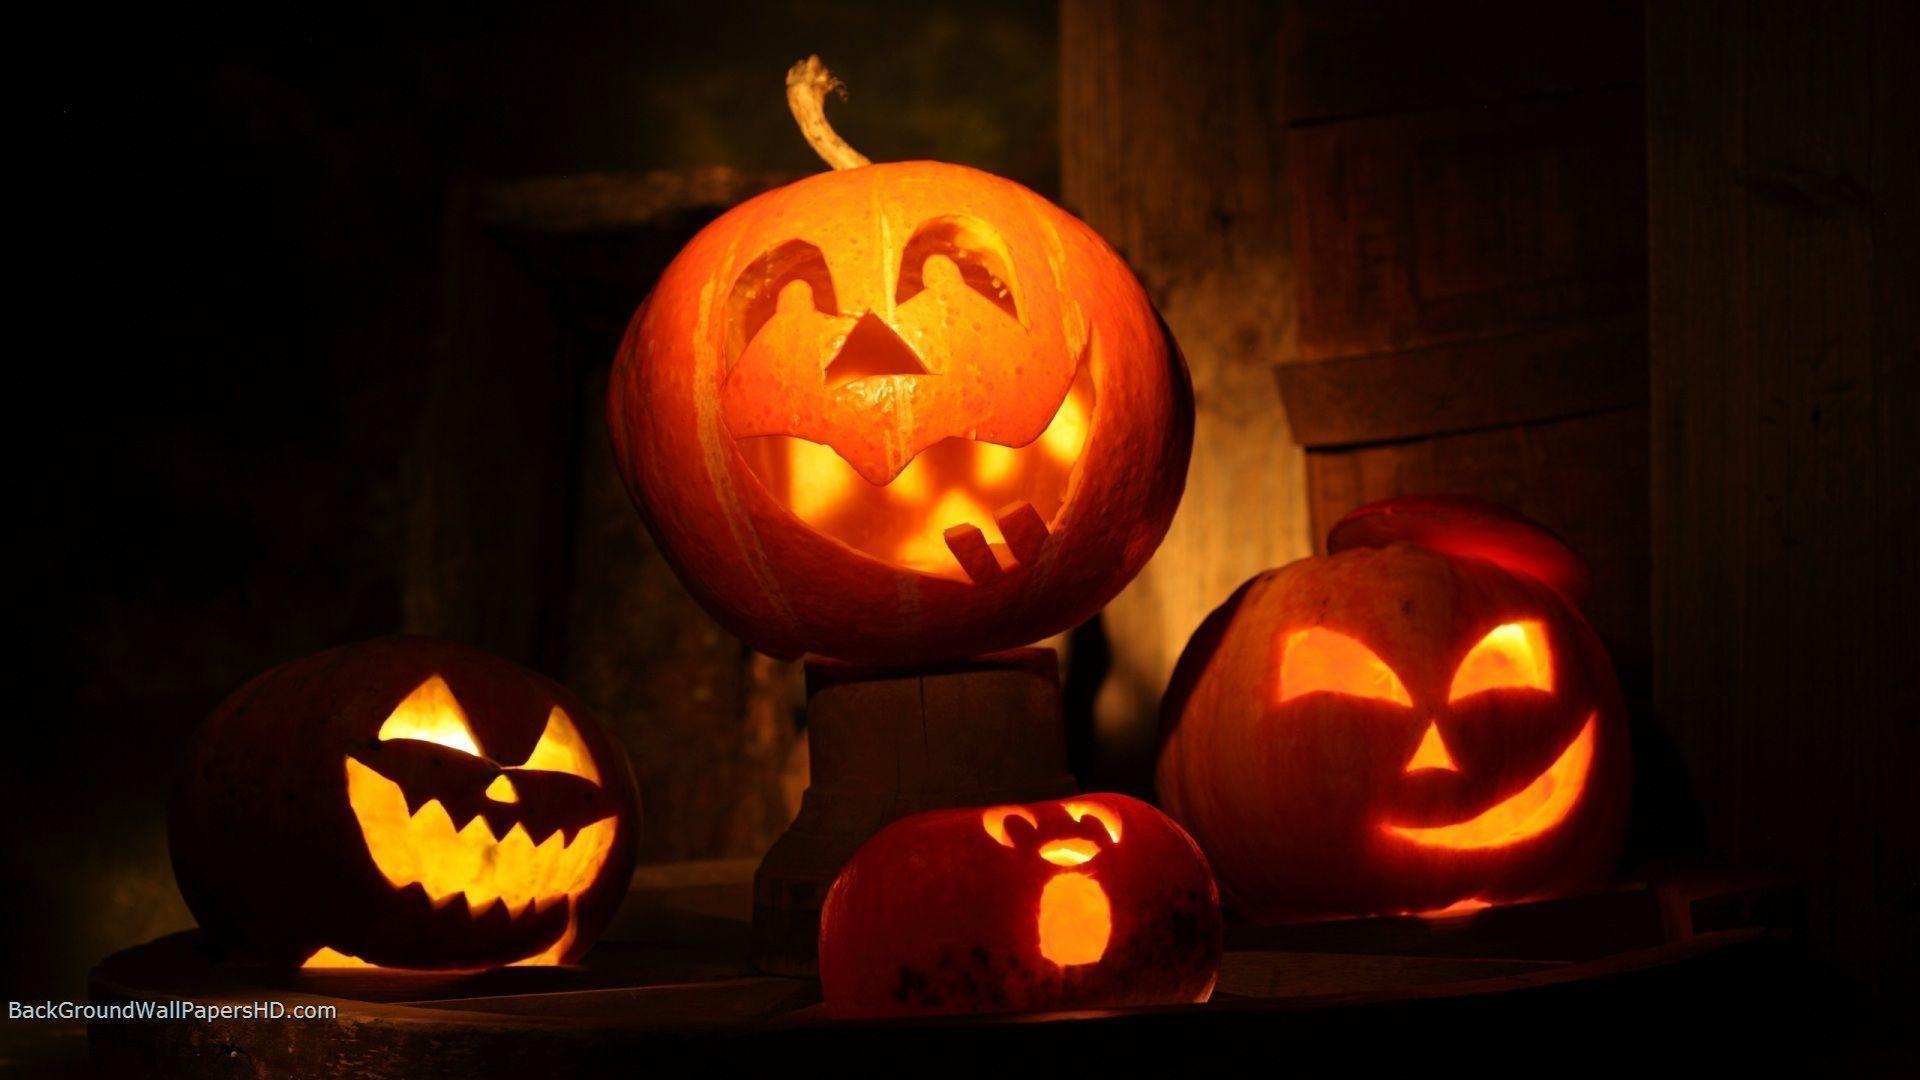 Avenged Sevenfold Iphone Wallpaper Scary Halloween Wallpaper Hd 183 ① Wallpapertag